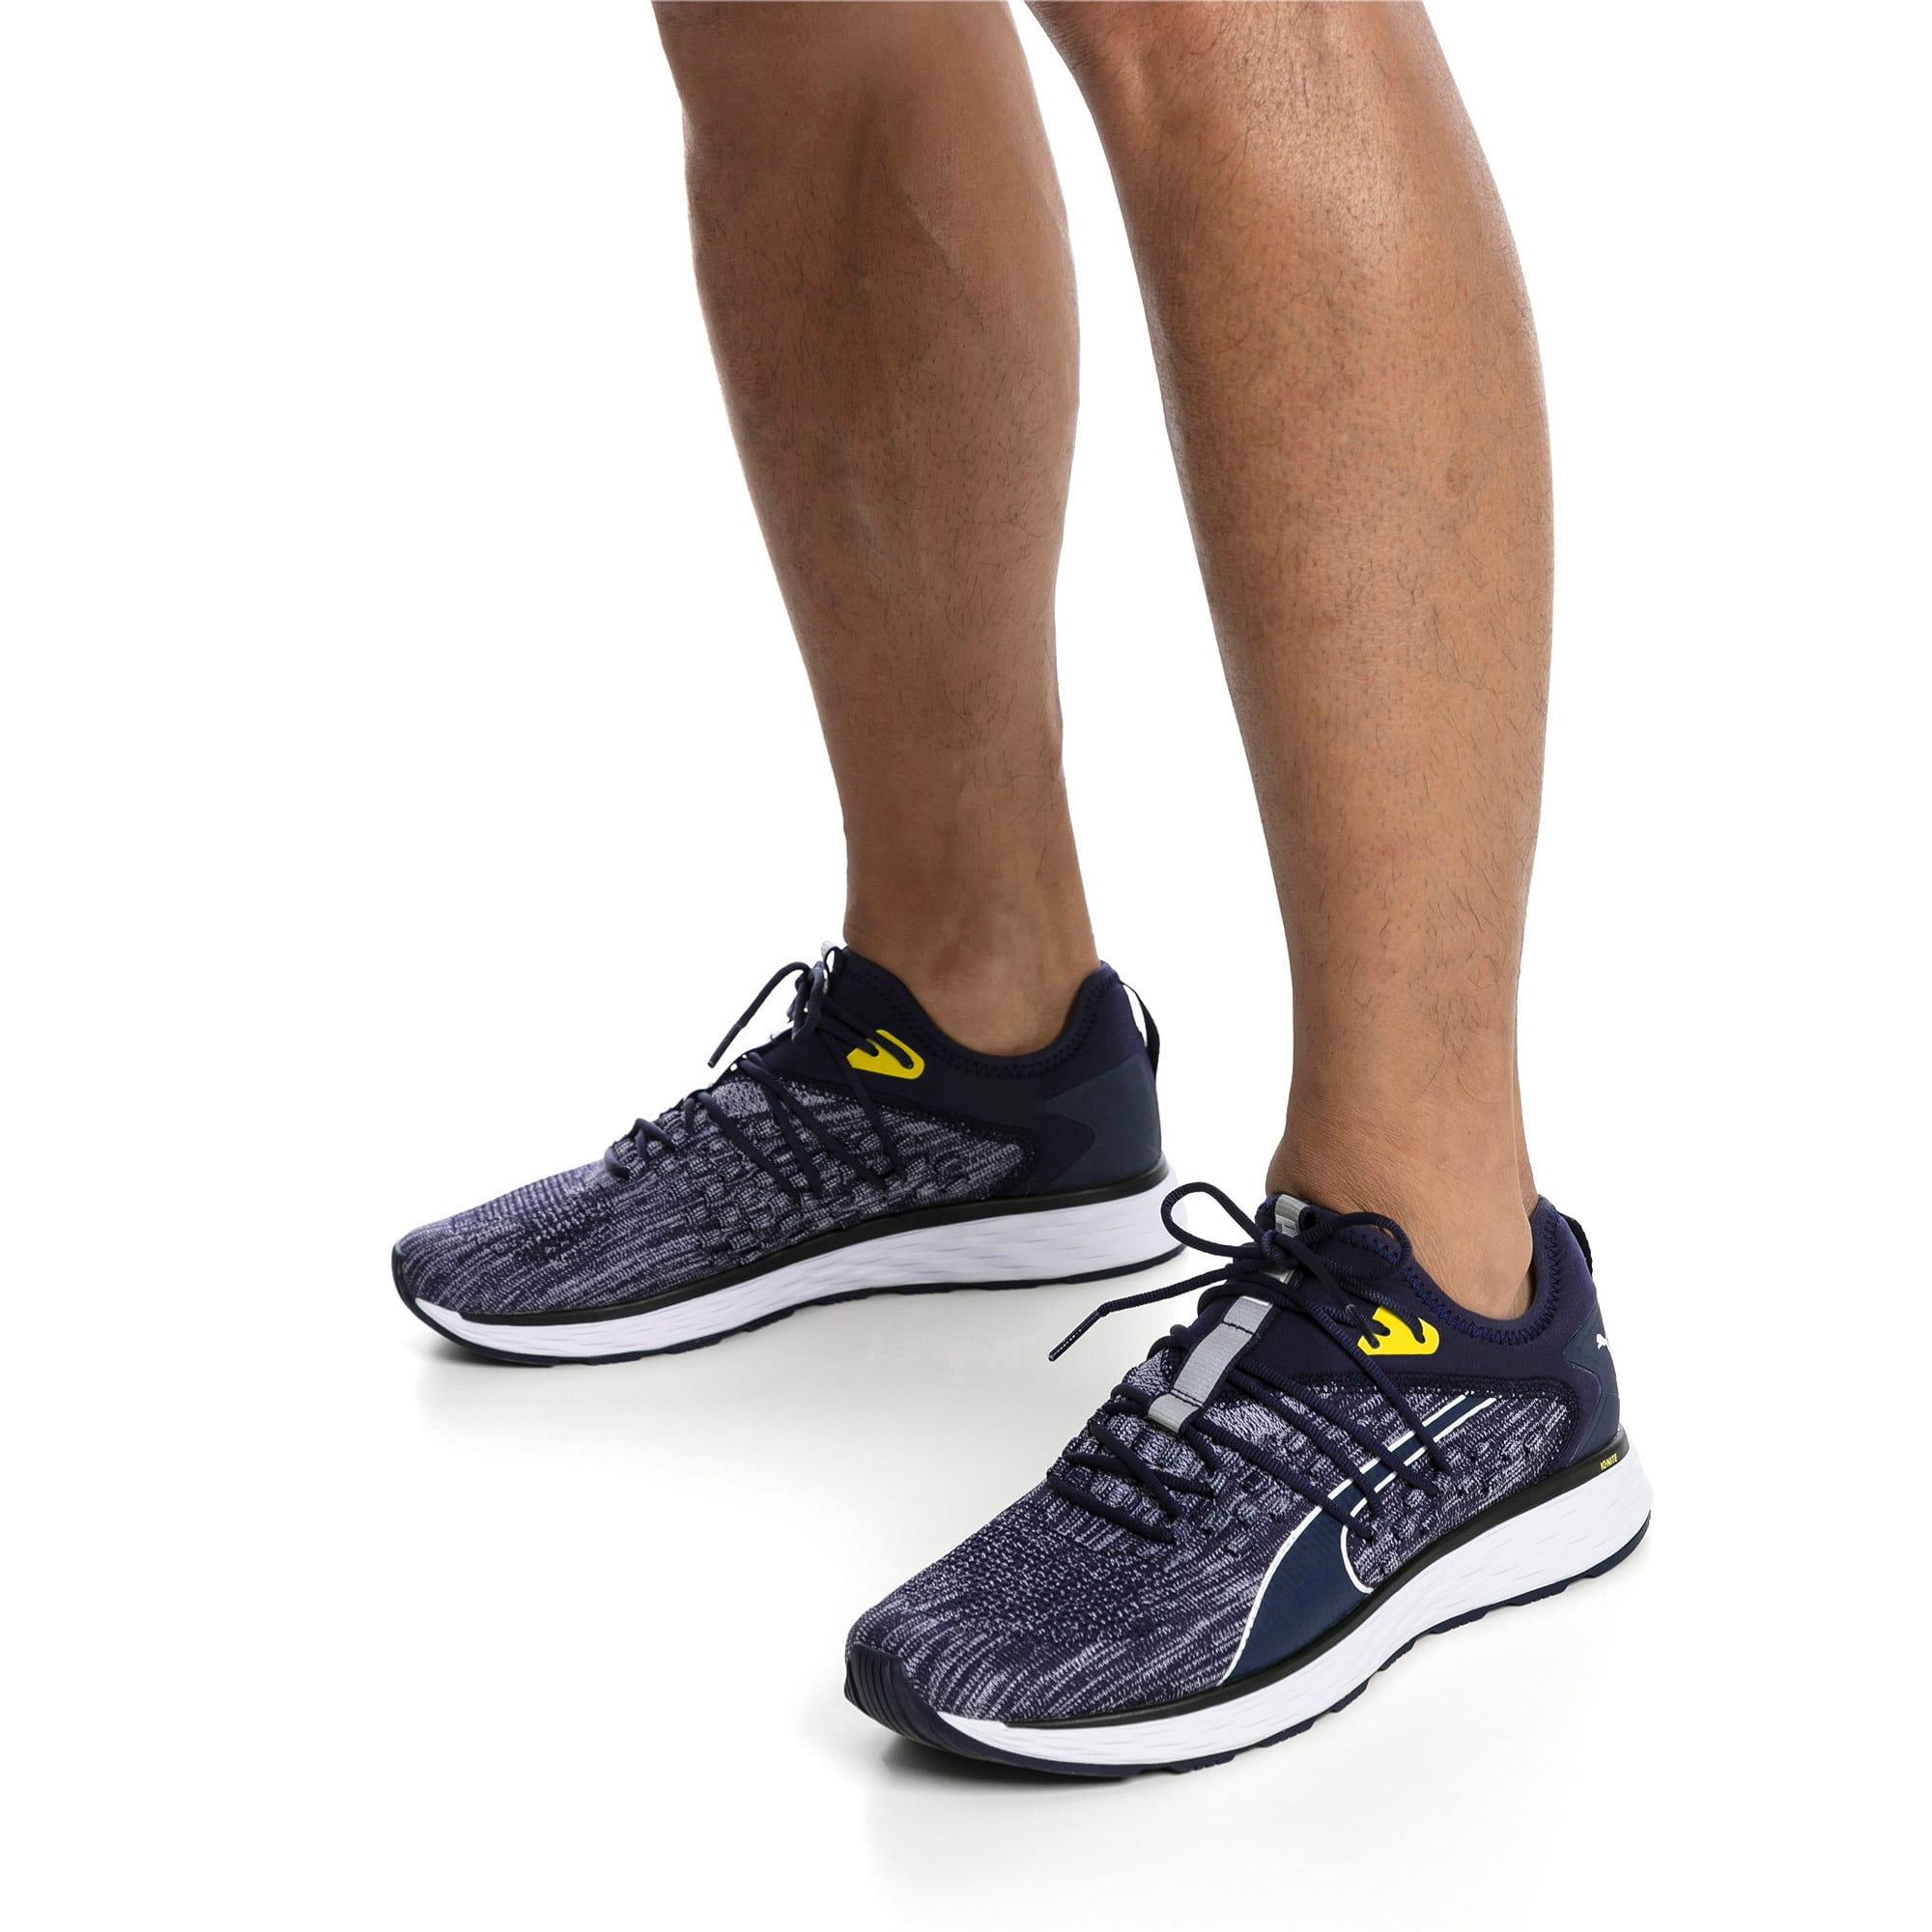 Thumbnail 2 of SPEED FUSEFIT Men's Running Shoes, Peacoat-White-Blazing Yellow, medium